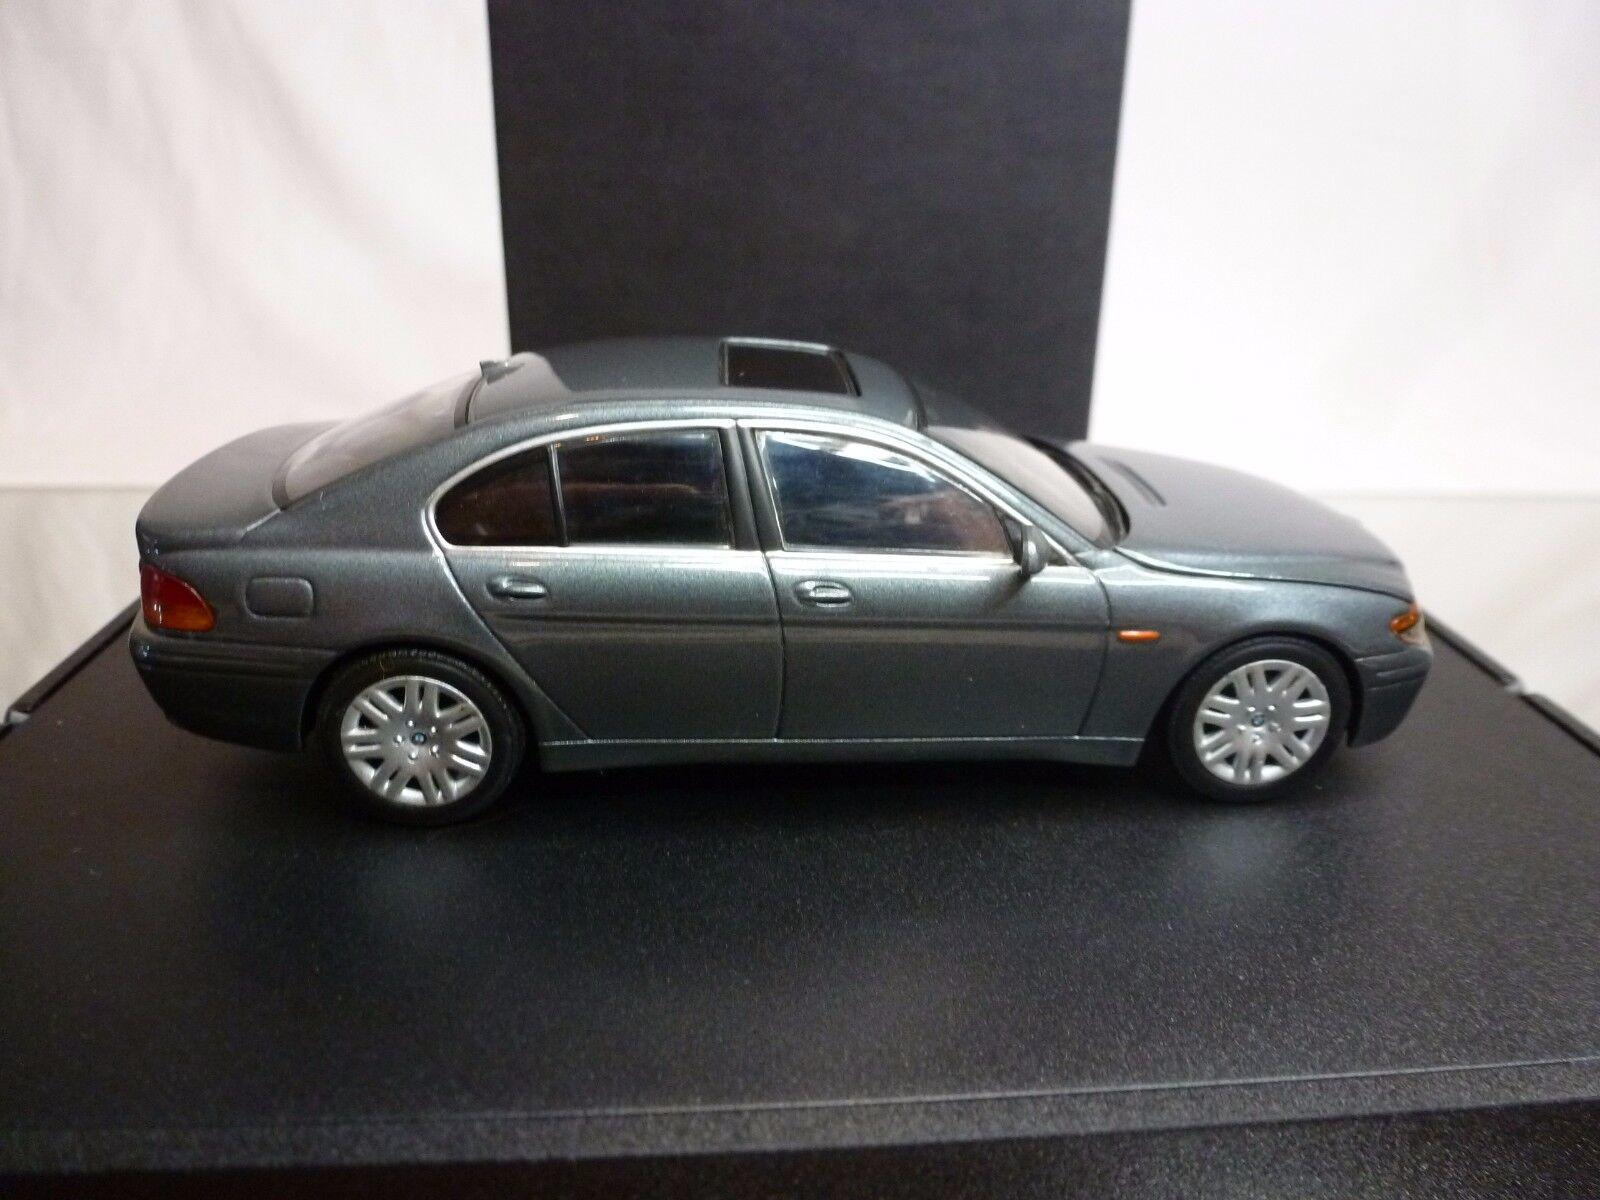 MINICHAMPS BMW 7 SERIES -  GREY METALLIC METALLIC METALLIC 1 43 - GOOD IN DEALER BOX 0f239d